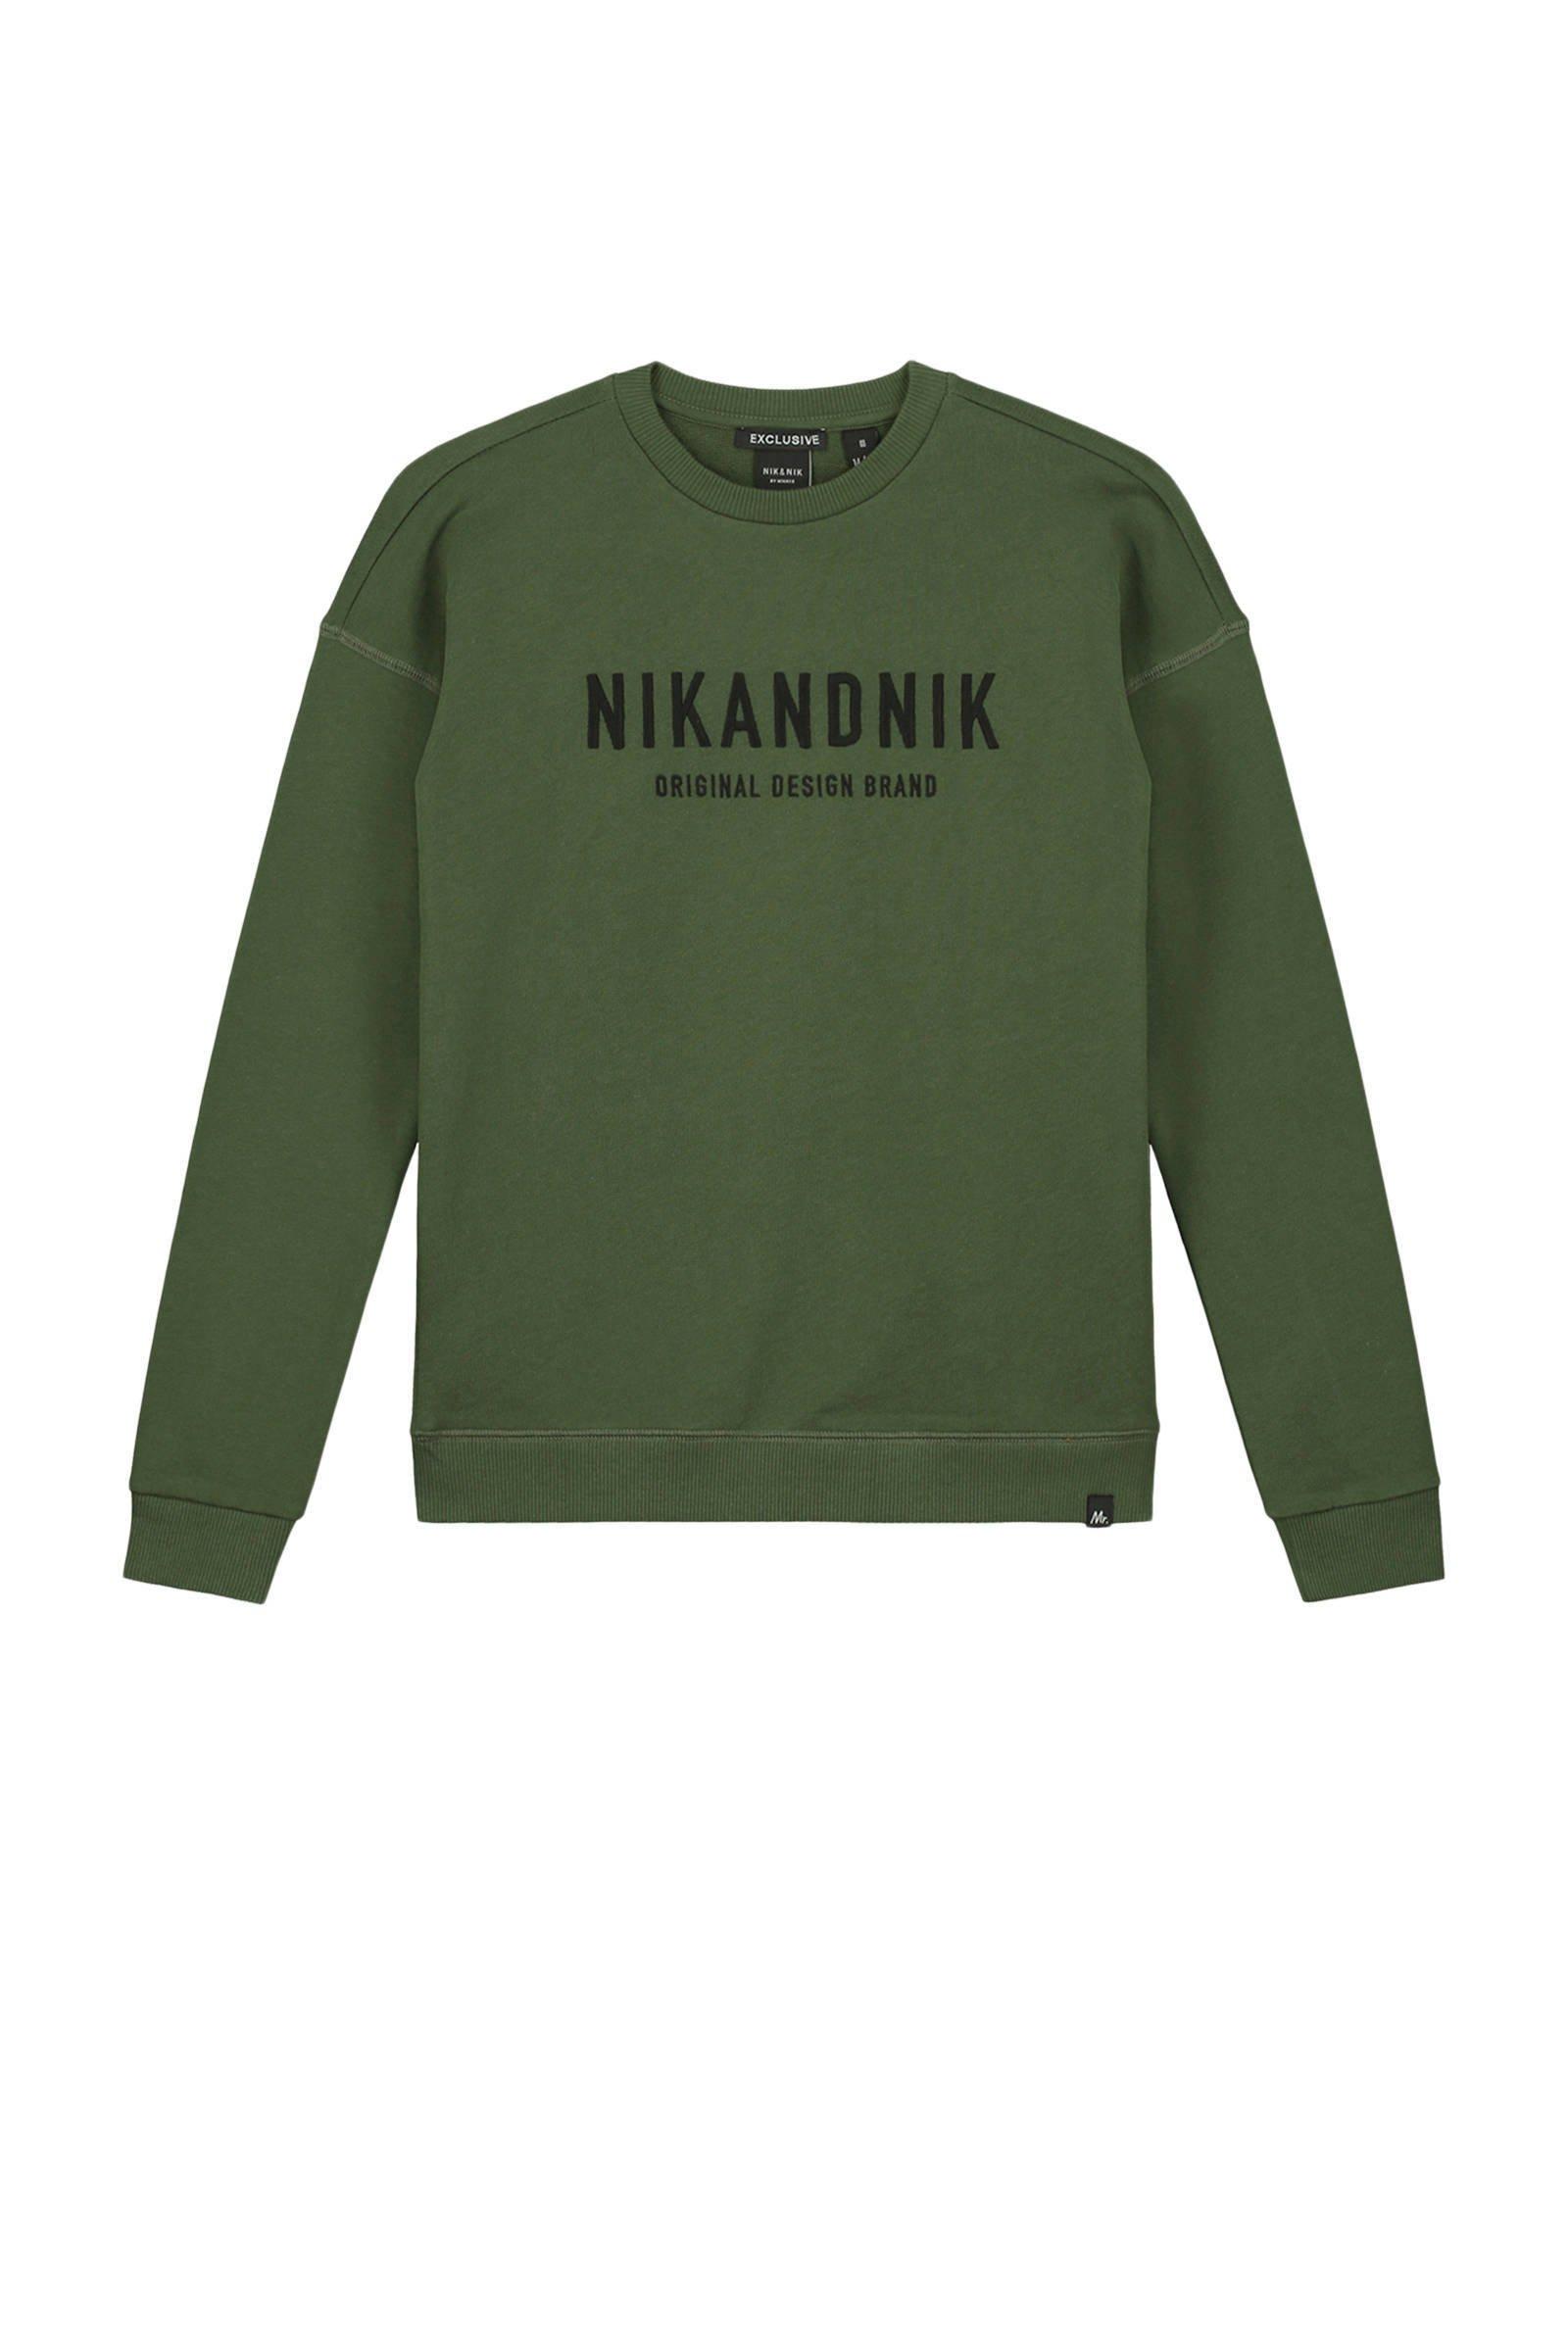 NIK&NIK sweater Milo met logo mosgroen - maat 176